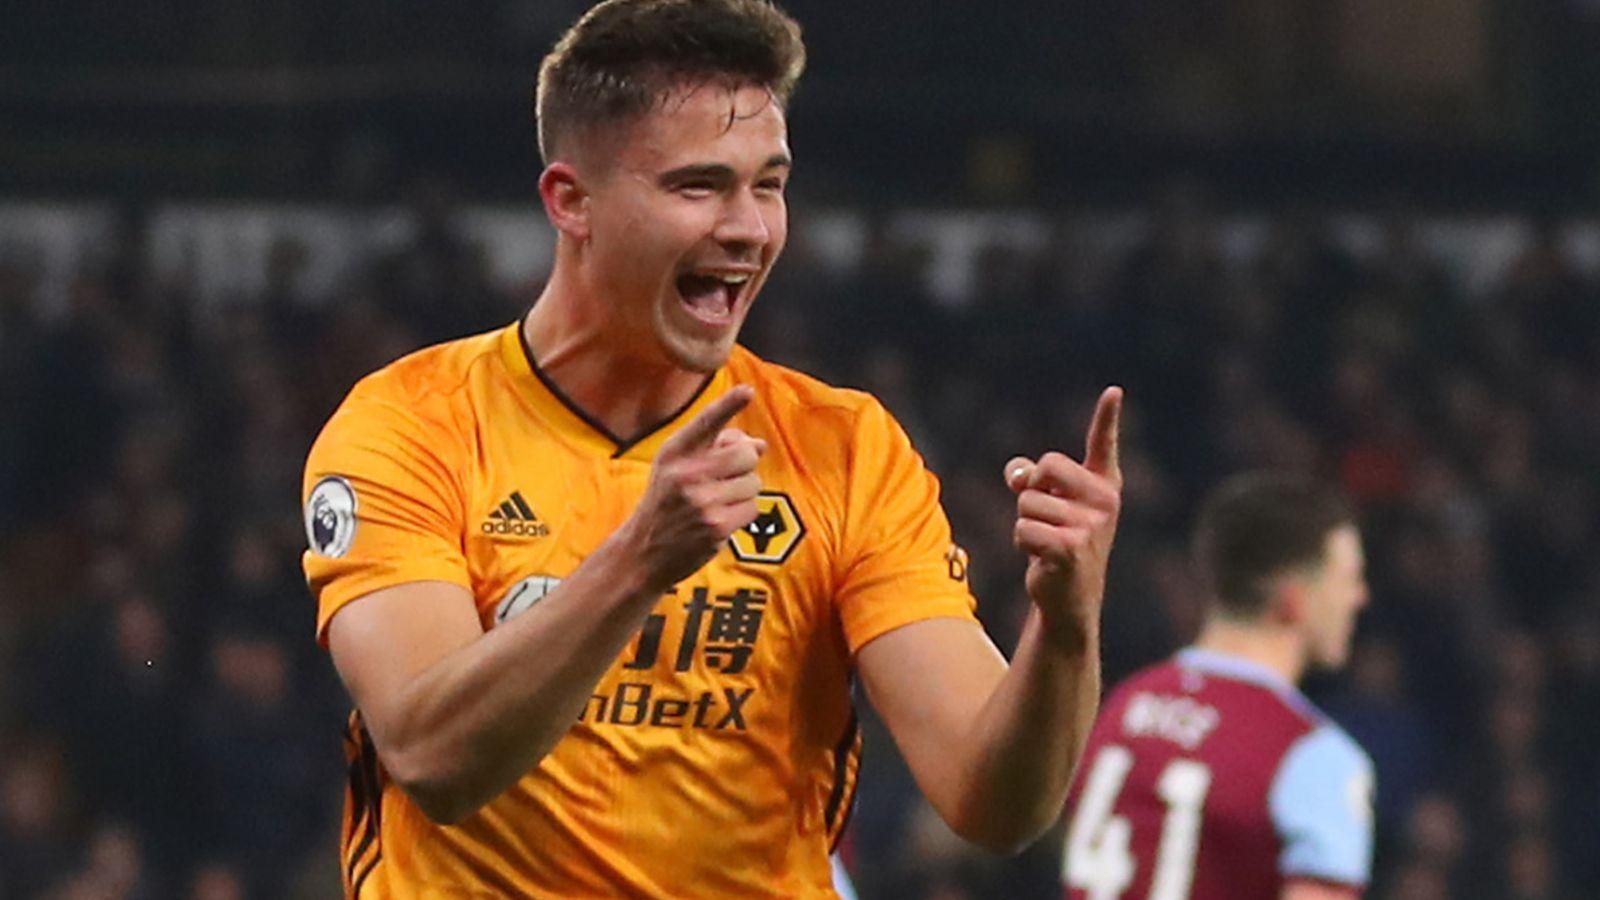 Report - Ham Match West 2 Highlights - Wolves 0 &